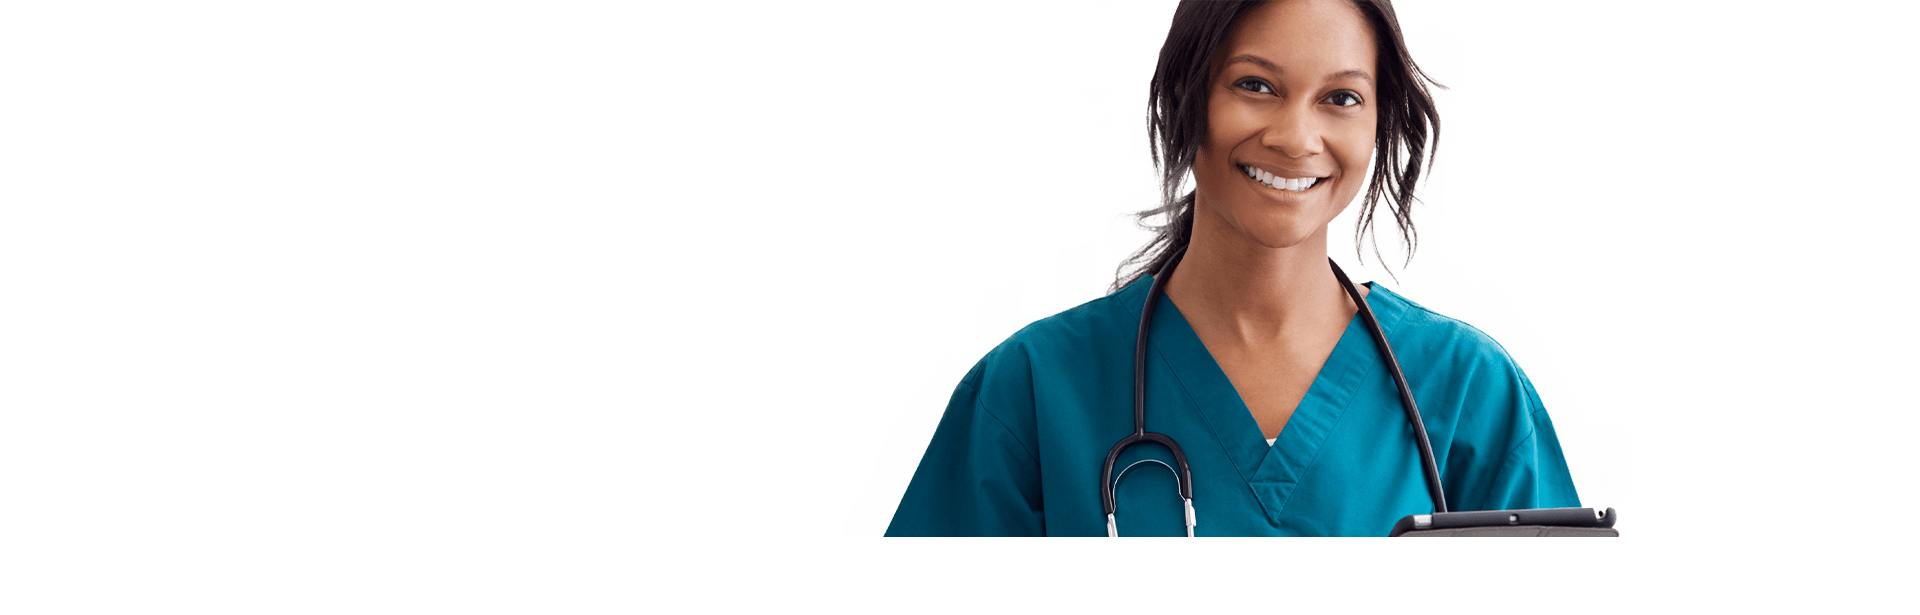 Biodegradable Medication Disposal for Medical Professional